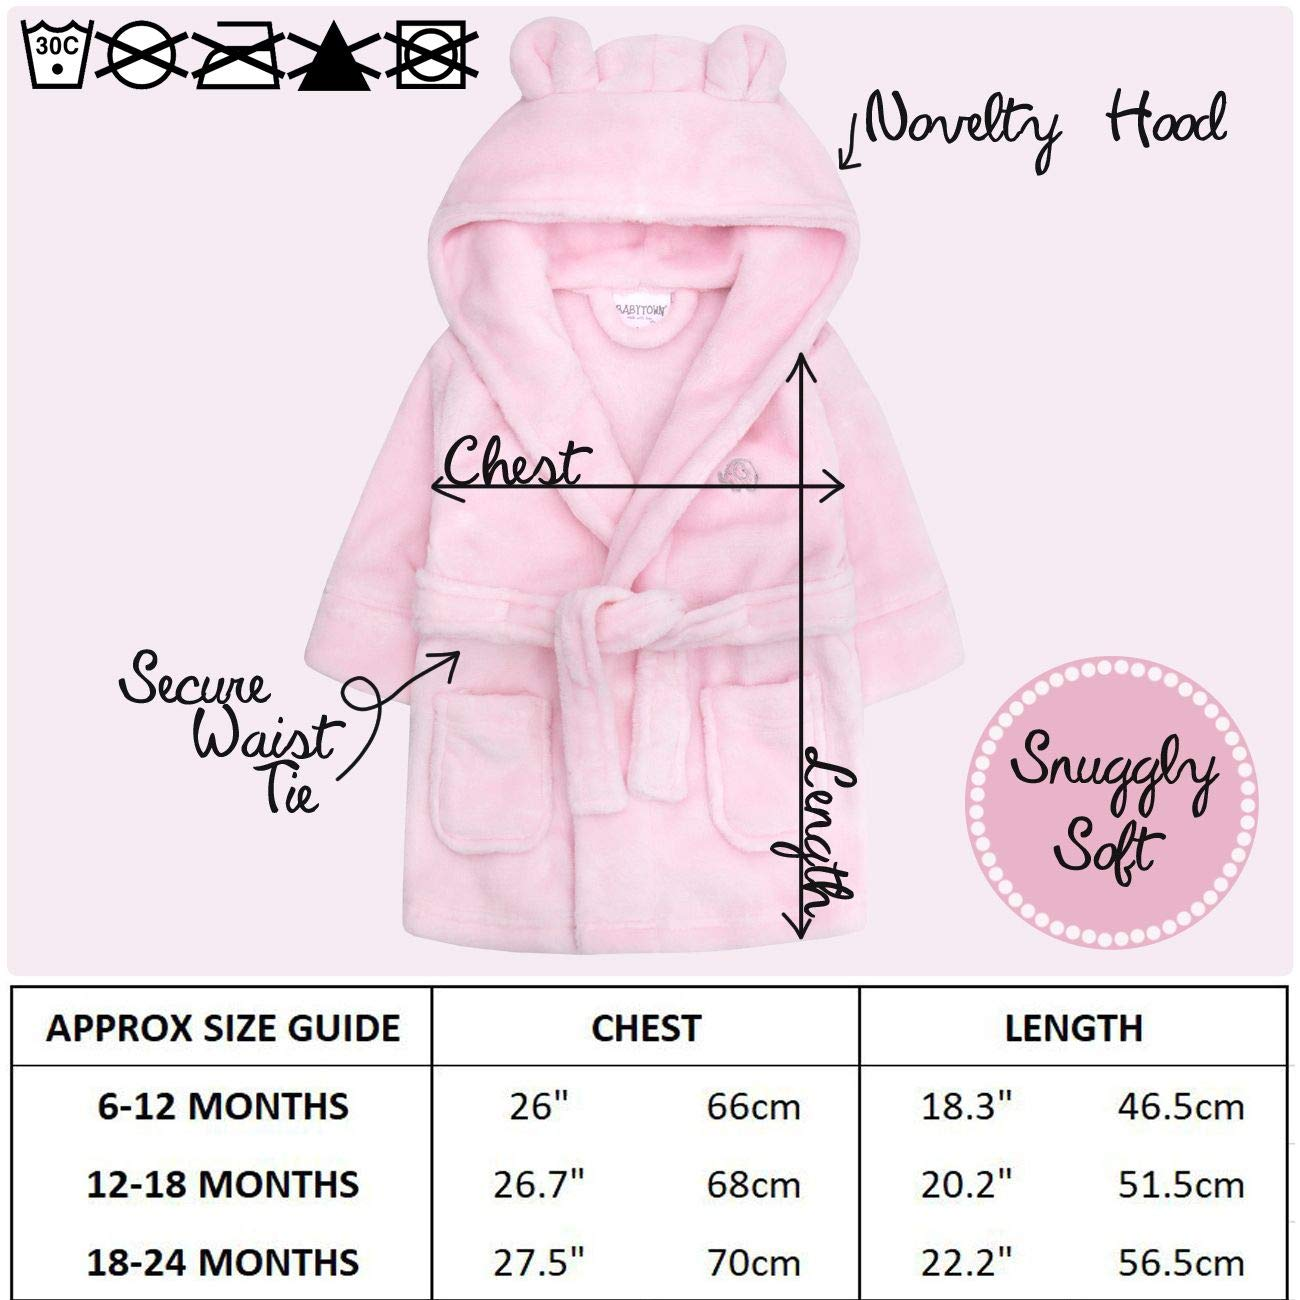 Baby Boys /& Girls Unisex Dressing Gown Ages 6-24 Months Soft Plush Flannel Fleece Hooded Bath Robe BabyTown